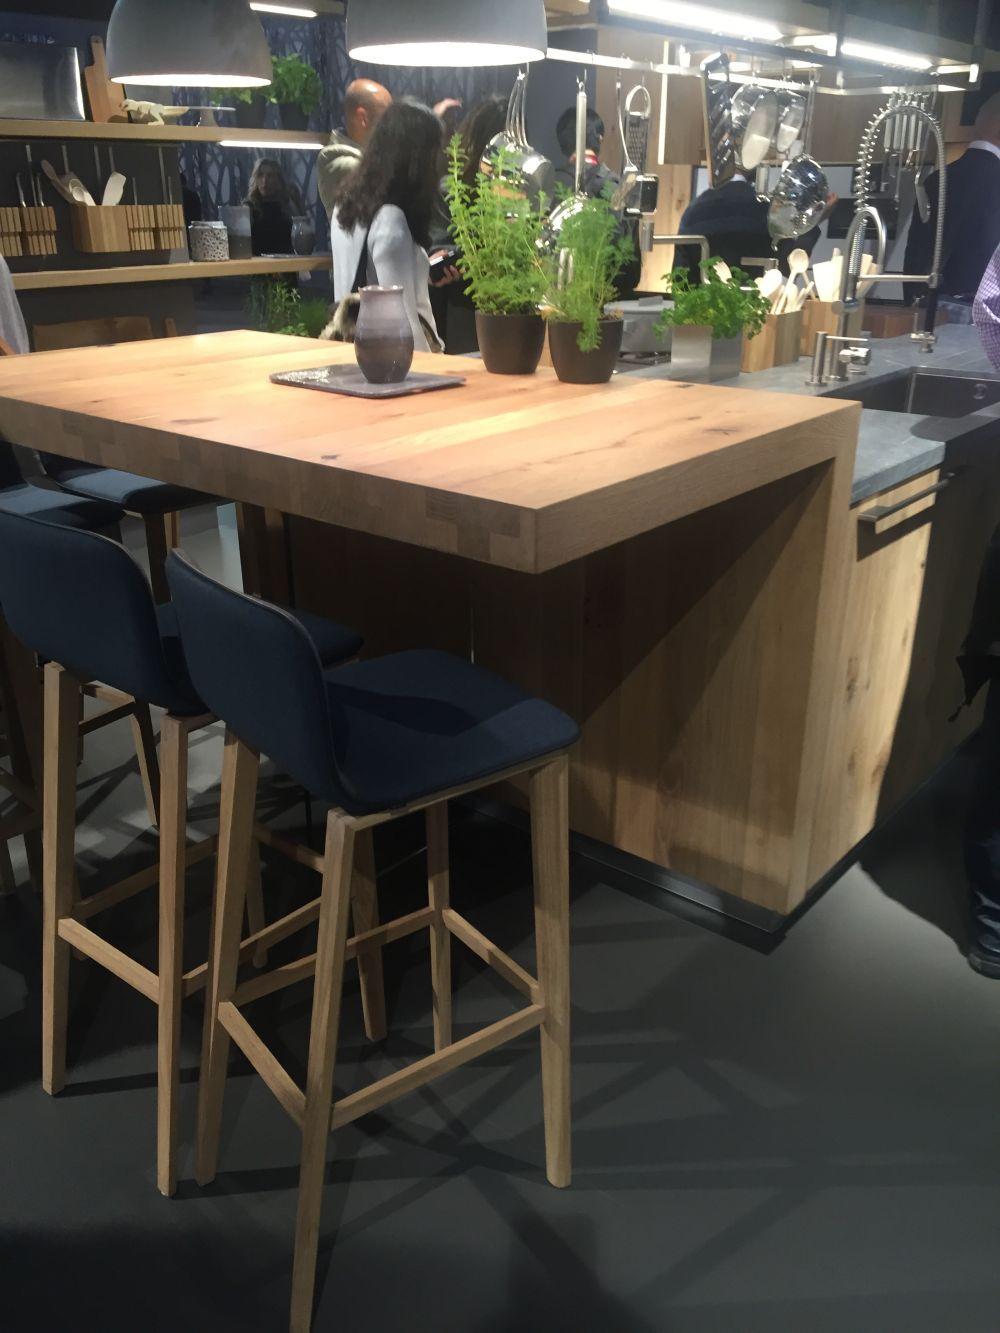 The Breakfast Bar Table